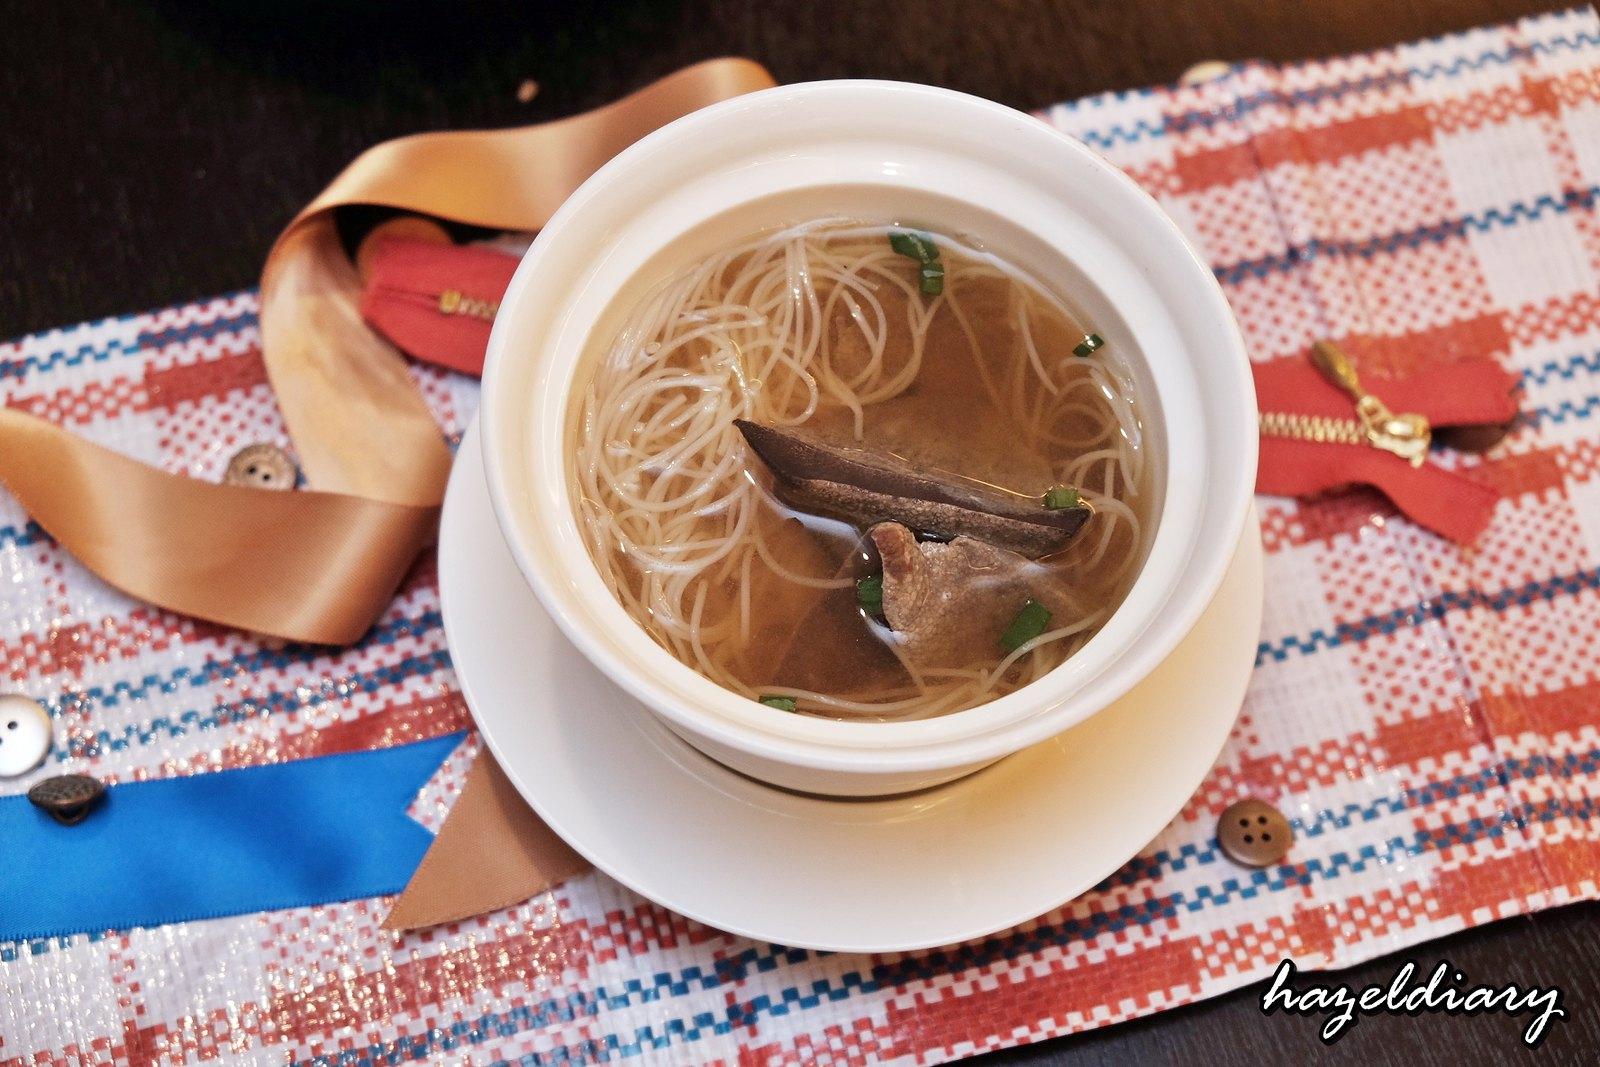 Hong Kong Tourism Board-Sham Shui Po-Liver noodles